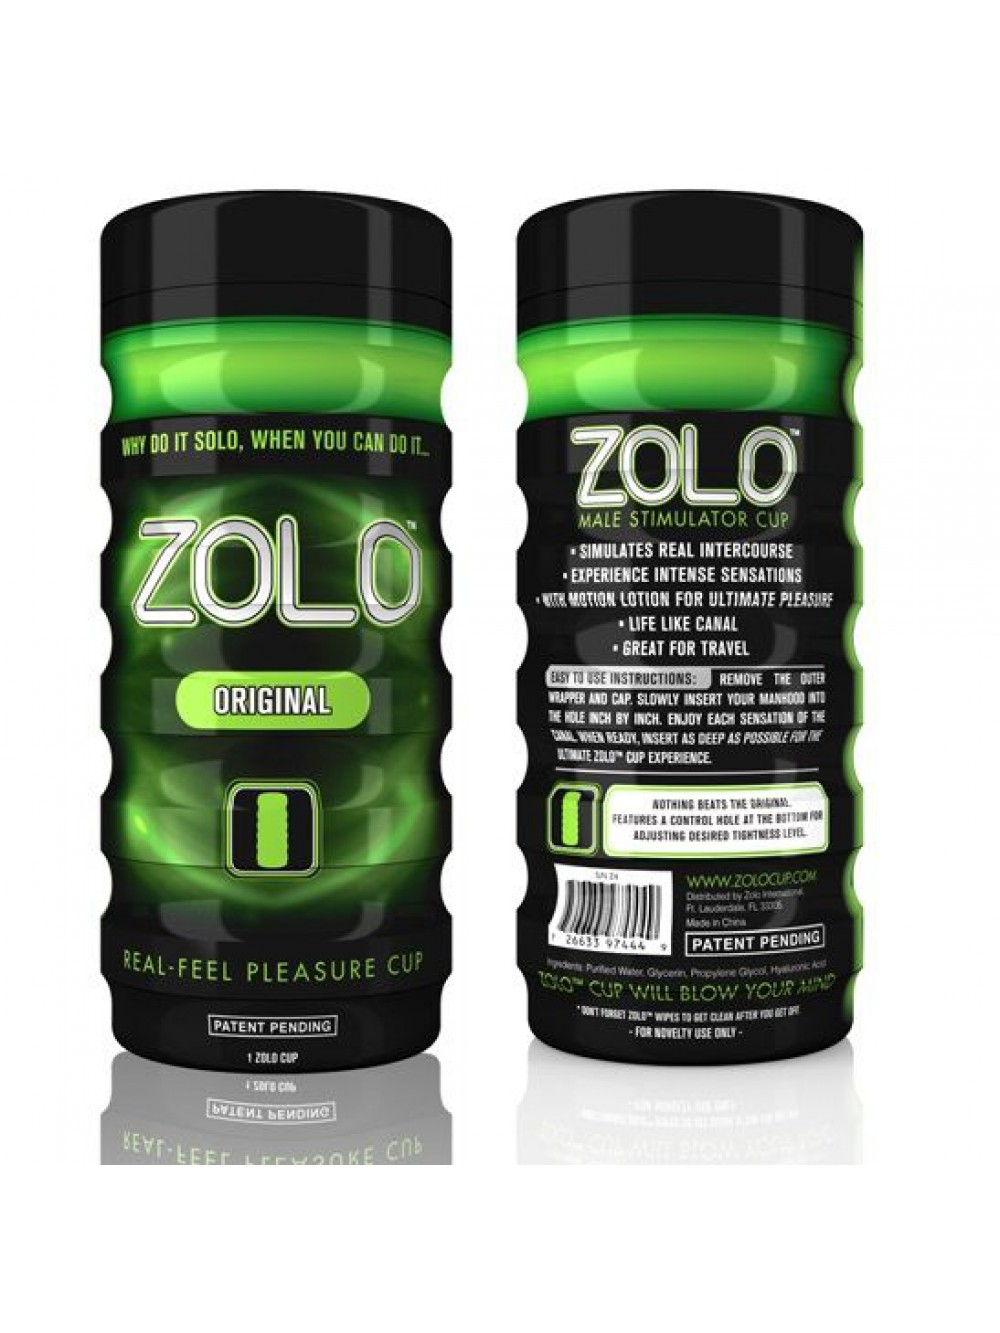 Original Zolo Cup